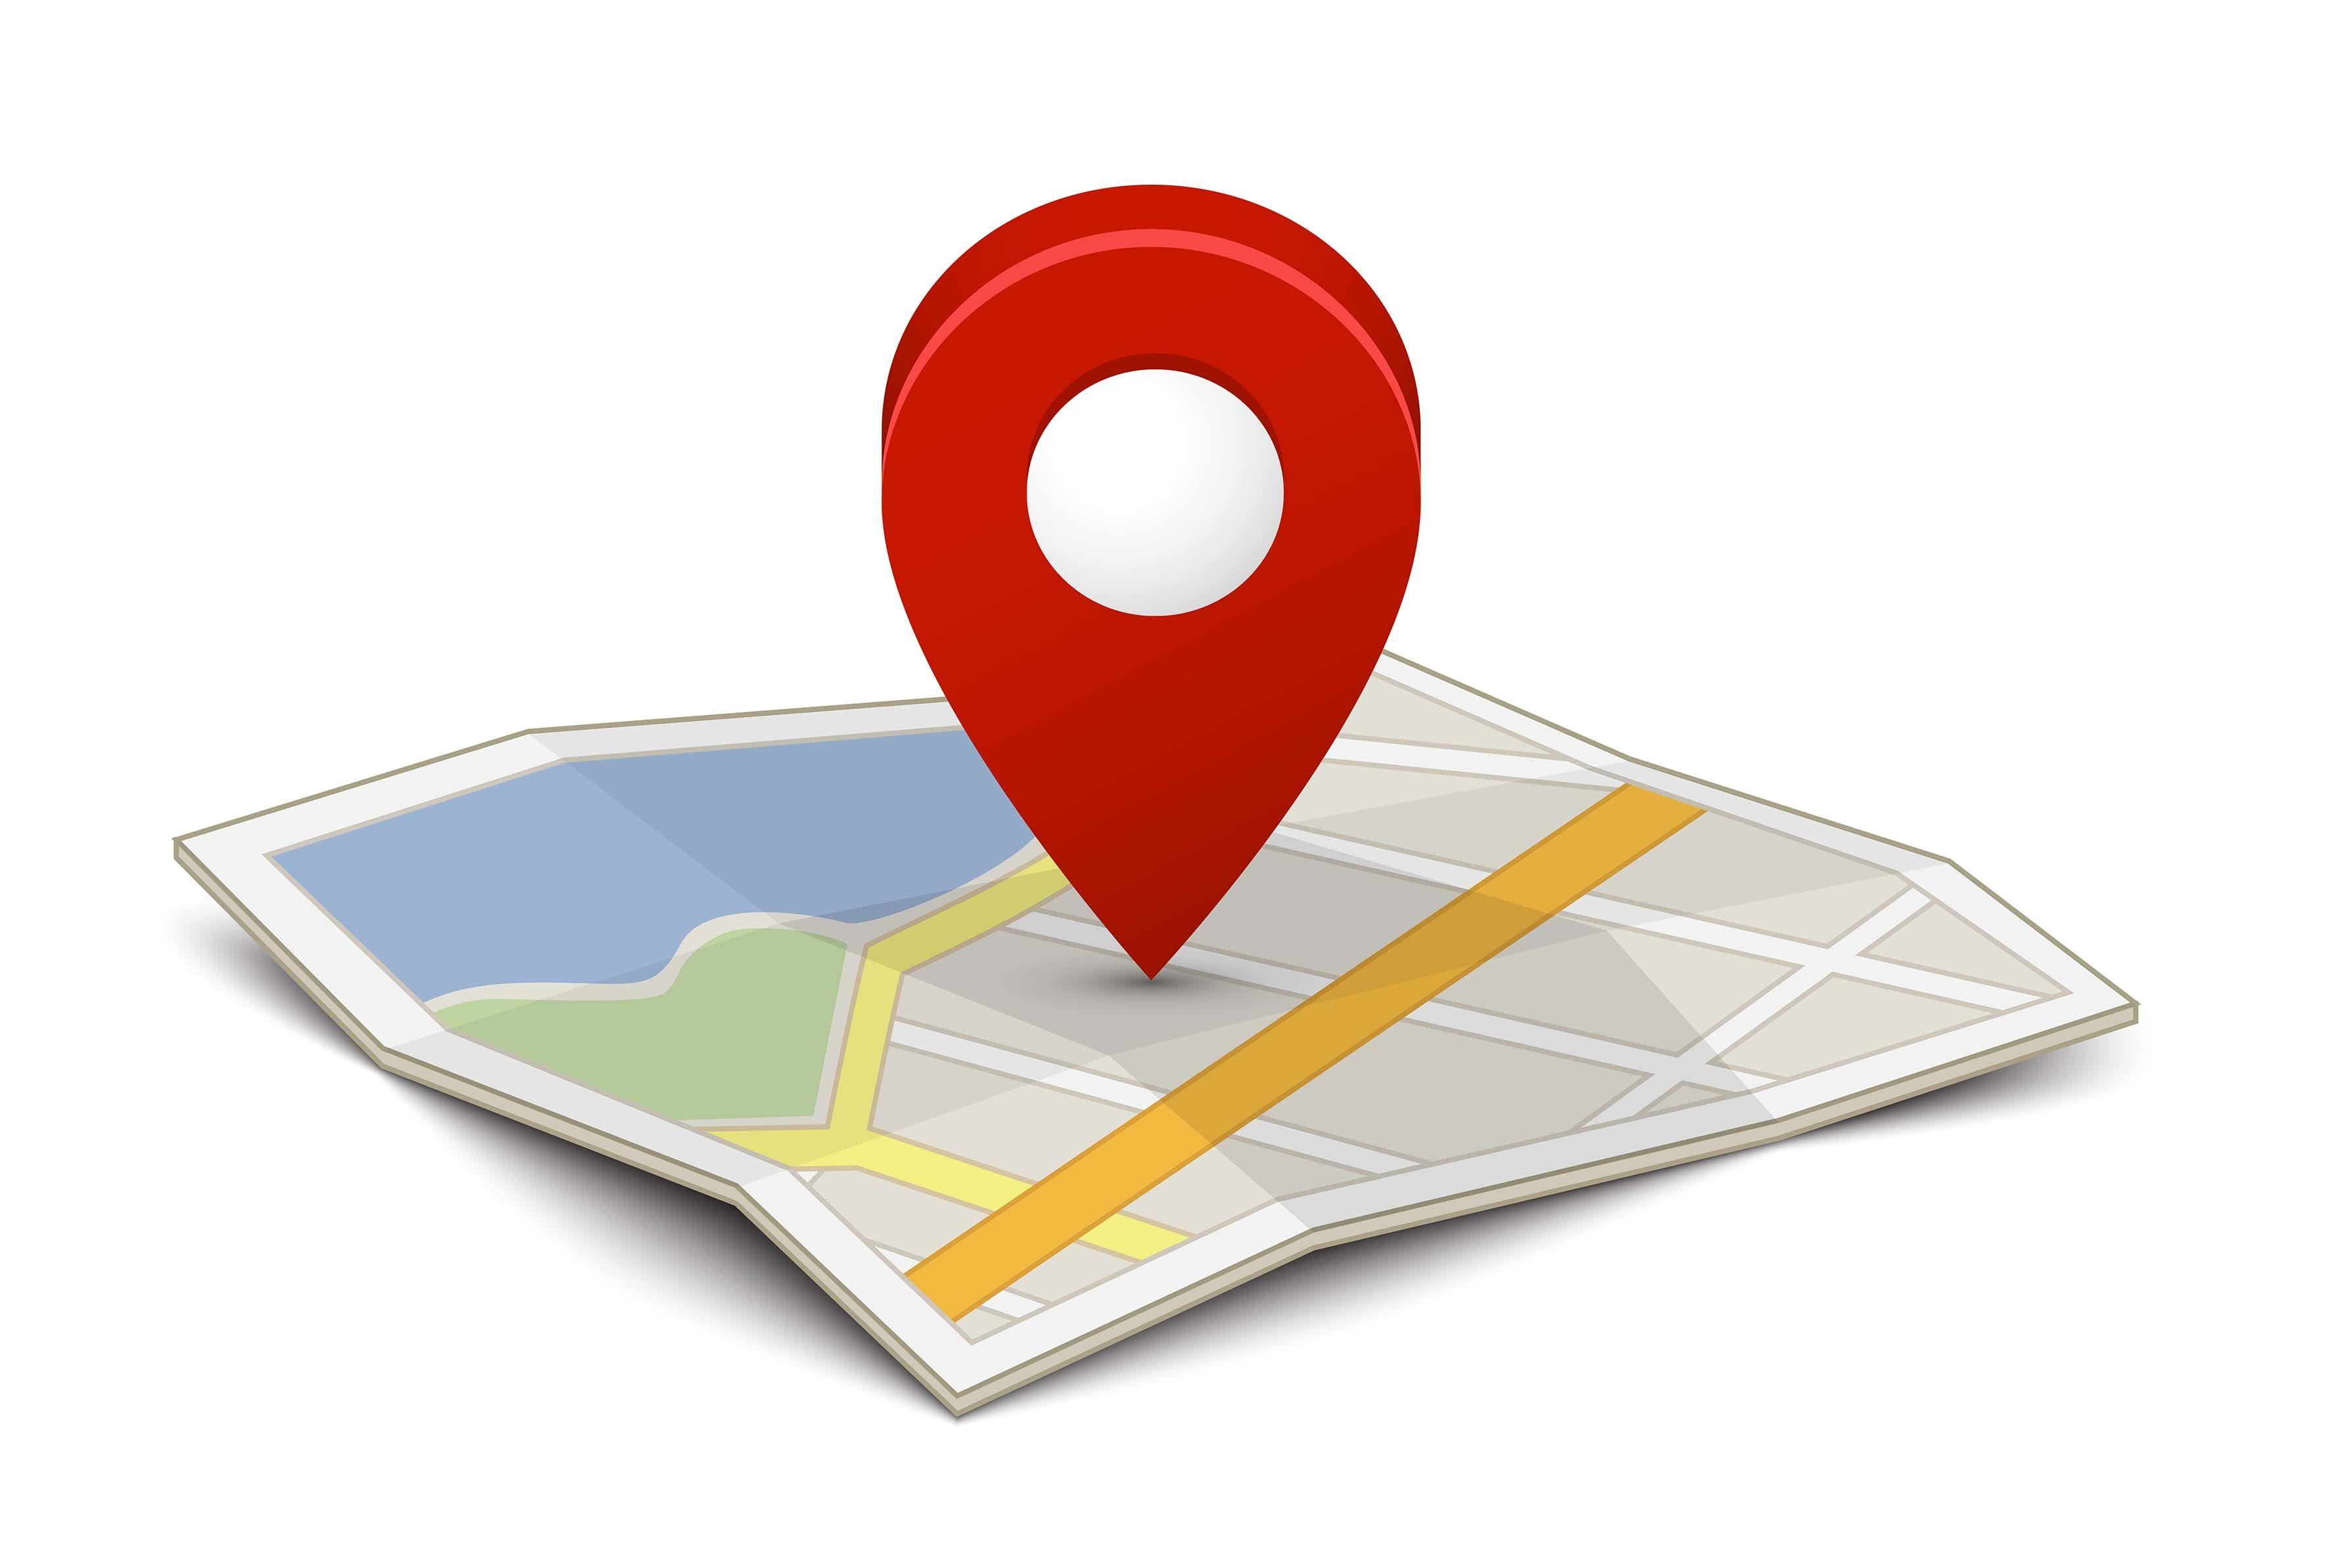 Miami Maps Optimization Seo services company, Best seo